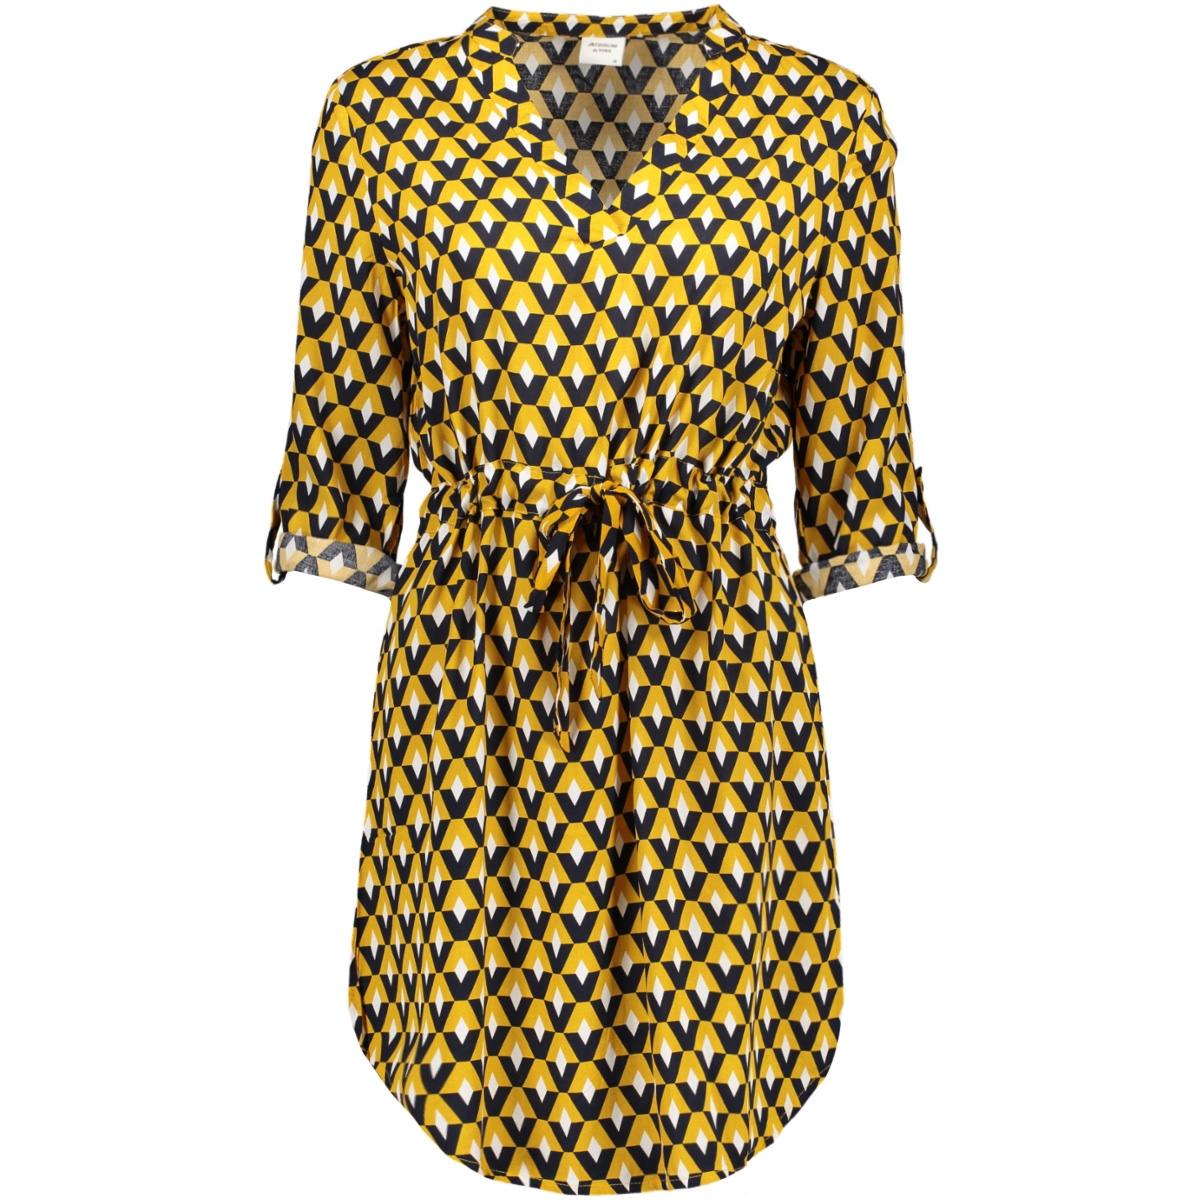 jdyniko 3/4 dress wvn 15183952 jacqueline de yong jurk harvest gold/geometric